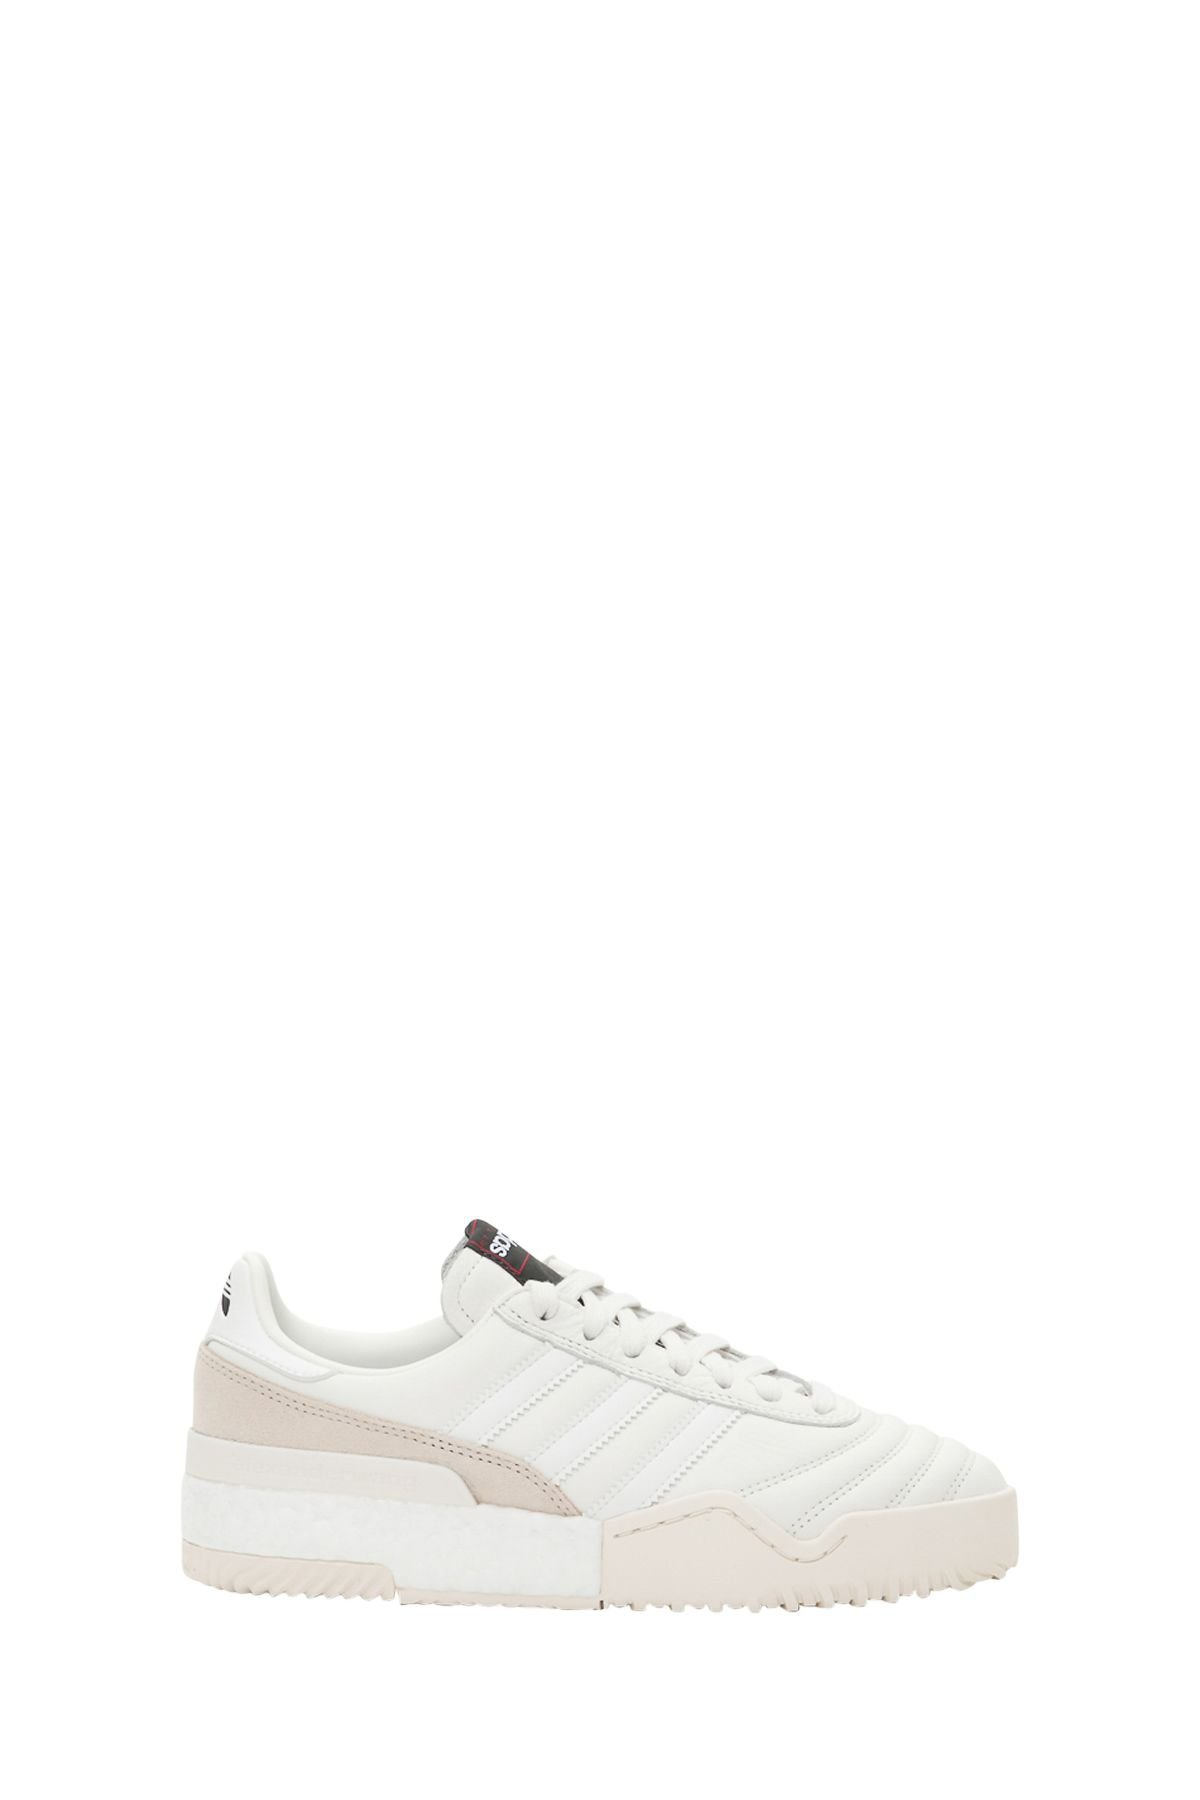 Adidas Originals by Alexander Wang Bball Soccer Sneakers